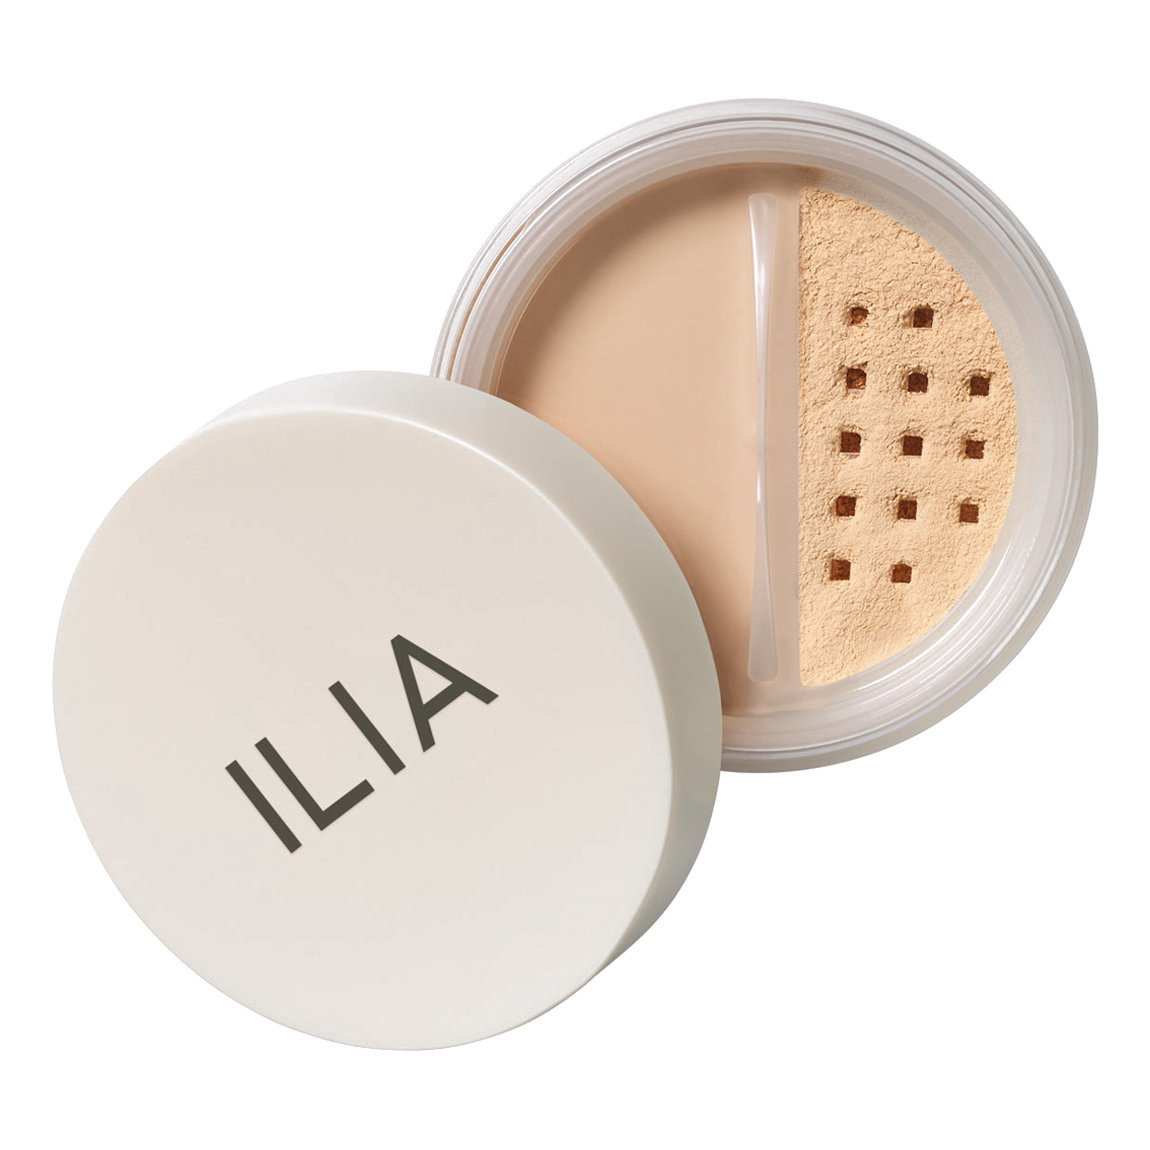 ILIA Radiant Translucent Powder SPF 20 Magic Sands alternative view 1.